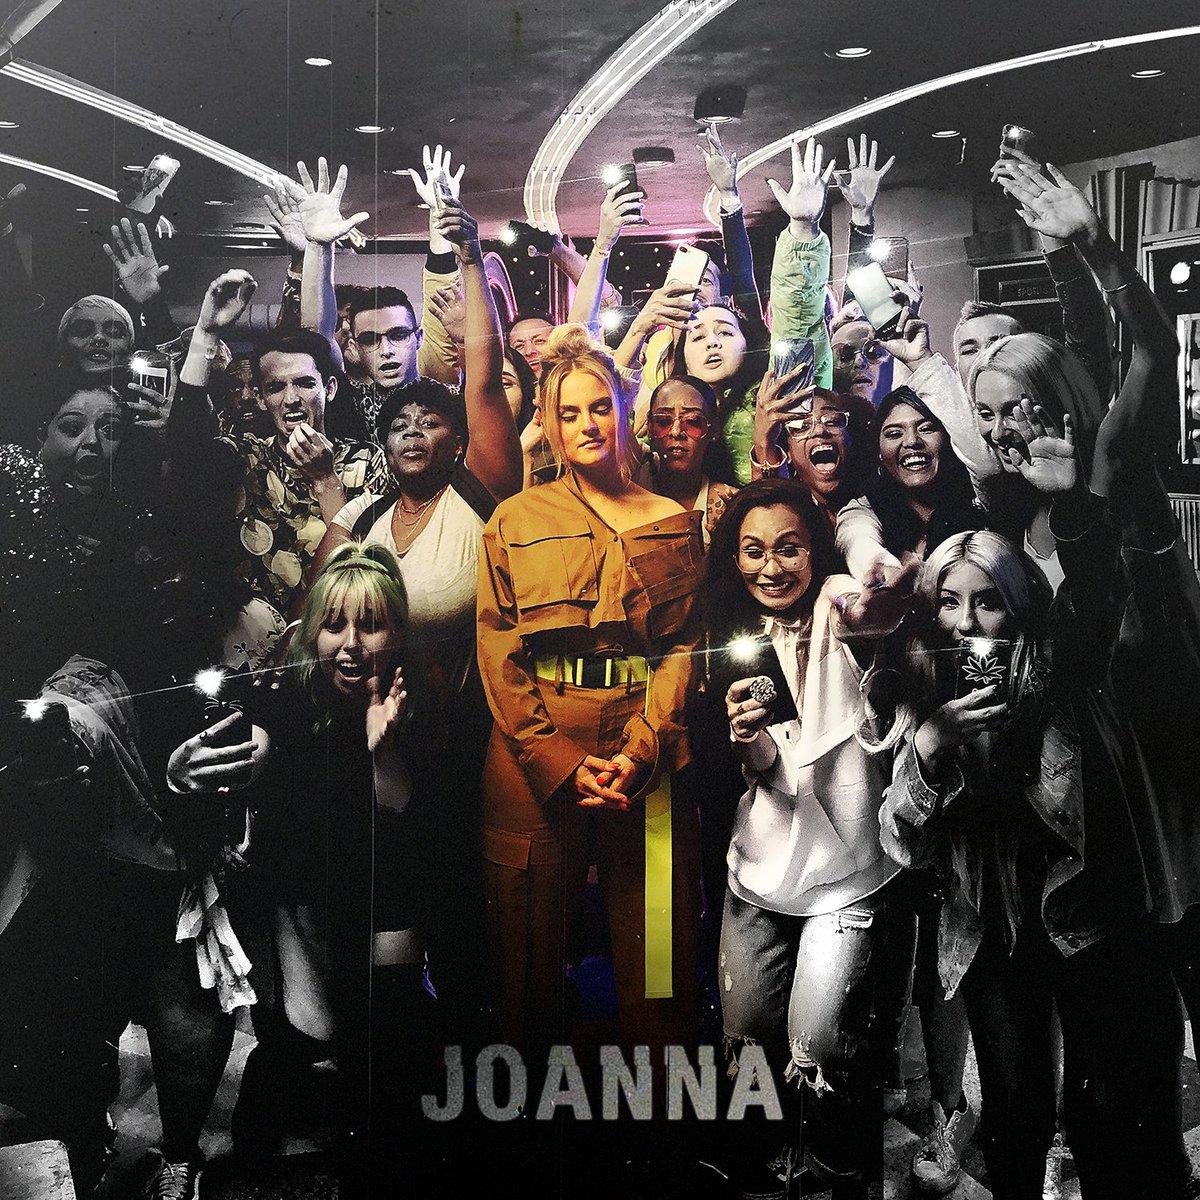 @WarnerCanada's photo on Joanna